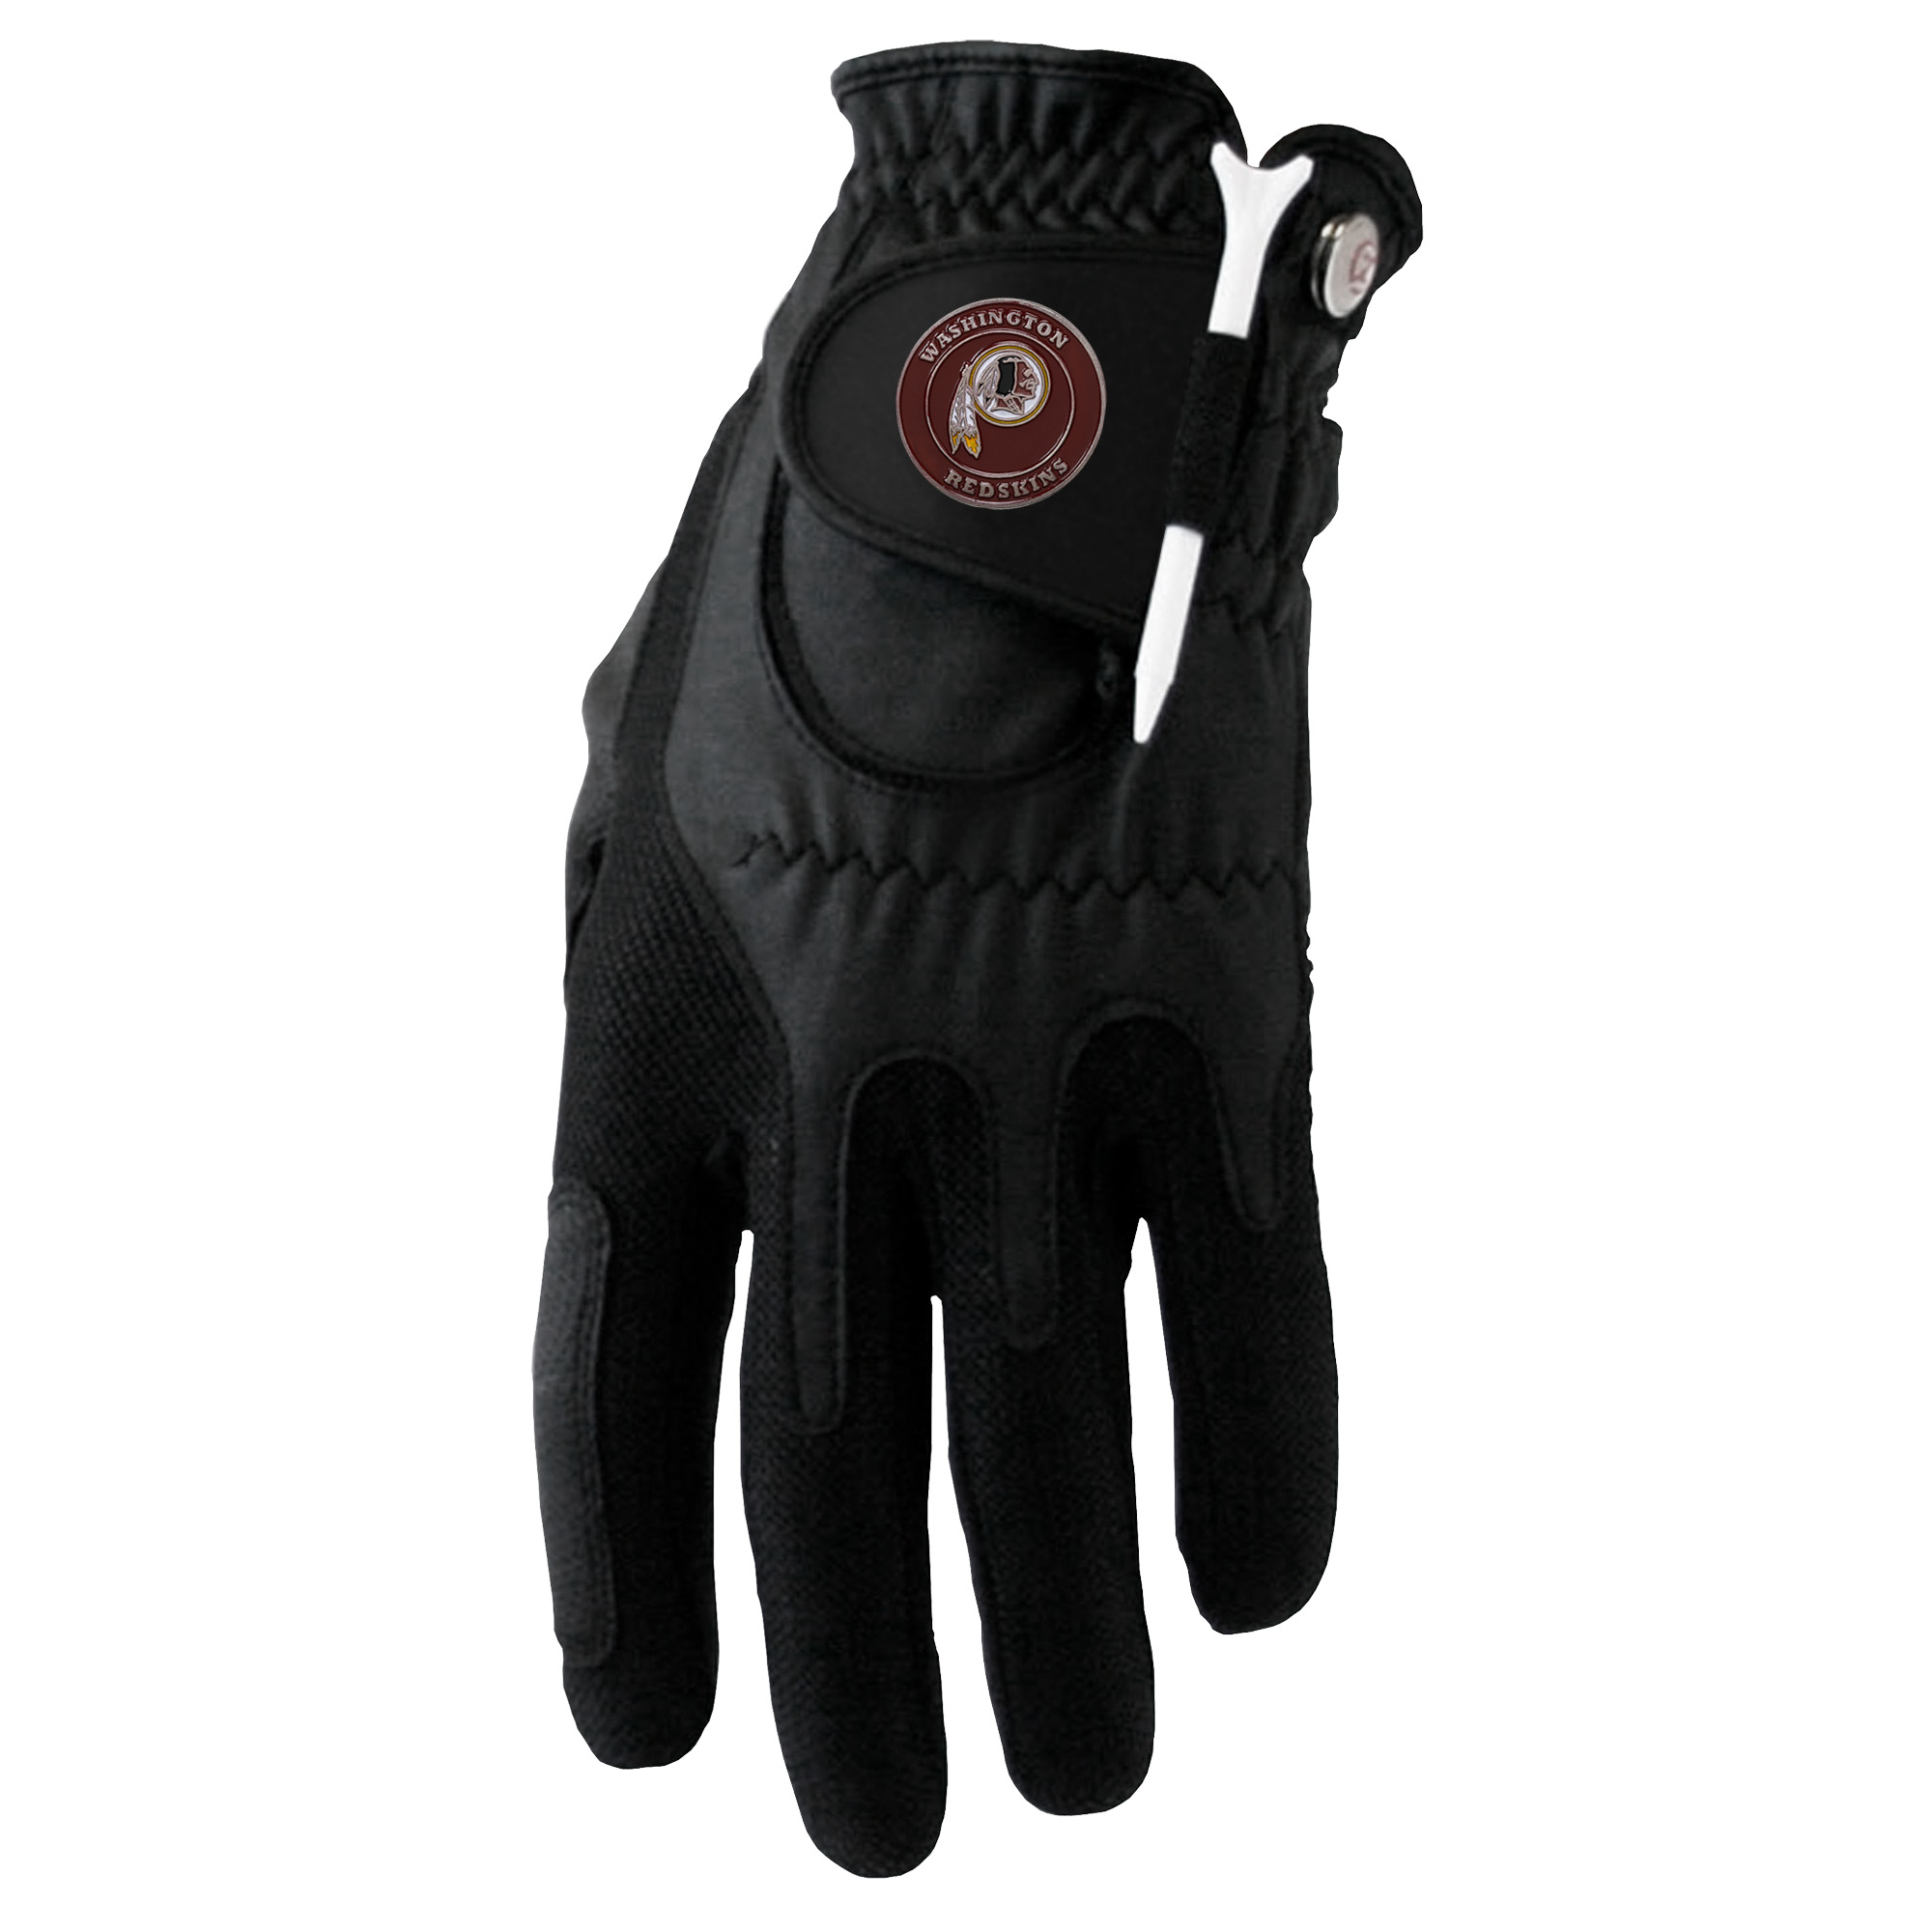 Washington Redskins Left Hand Golf Glove & Ball Marker Set - Black - OSFM